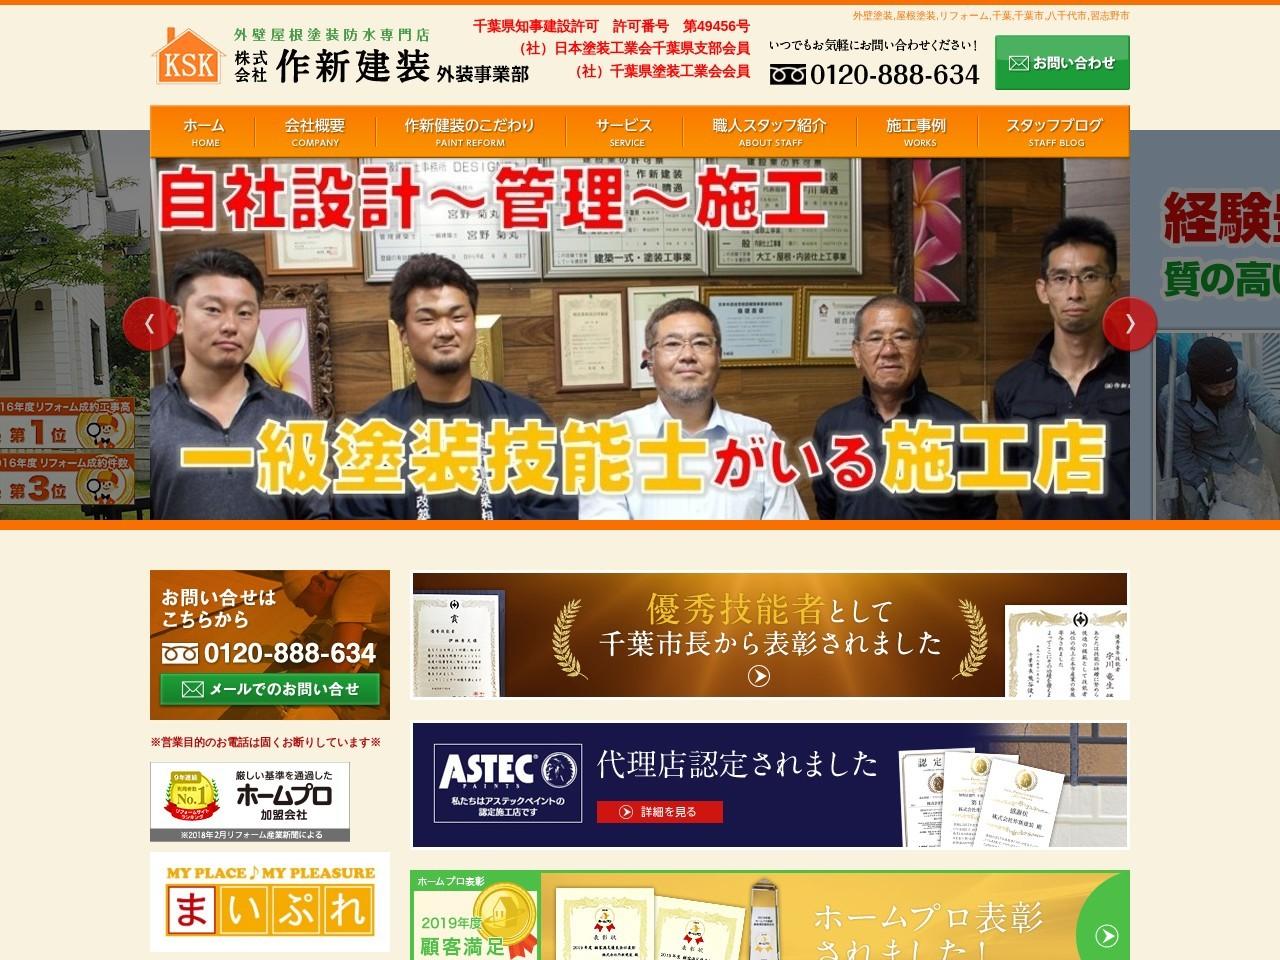 https://www.sakushin-kensou.com/%20https://www.sakushinreform.com/